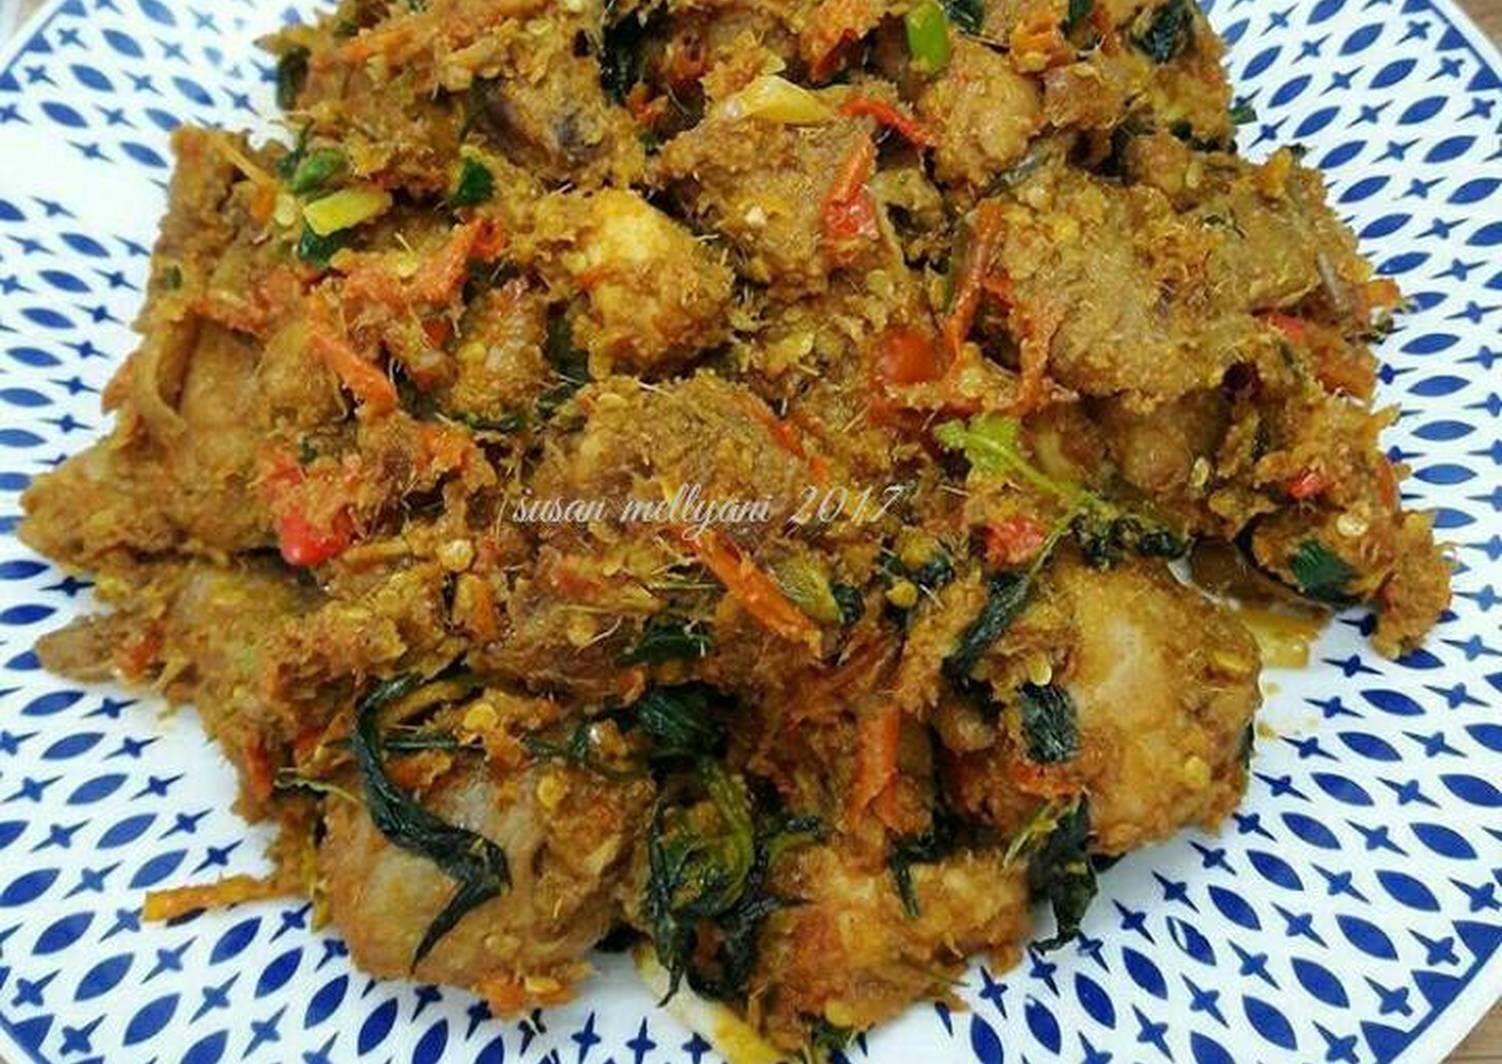 Resep Ayam Rw Khas Manado Oleh Susan Mellyani Resep Resep Ayam Makanan Dan Minuman Masakan Indonesia